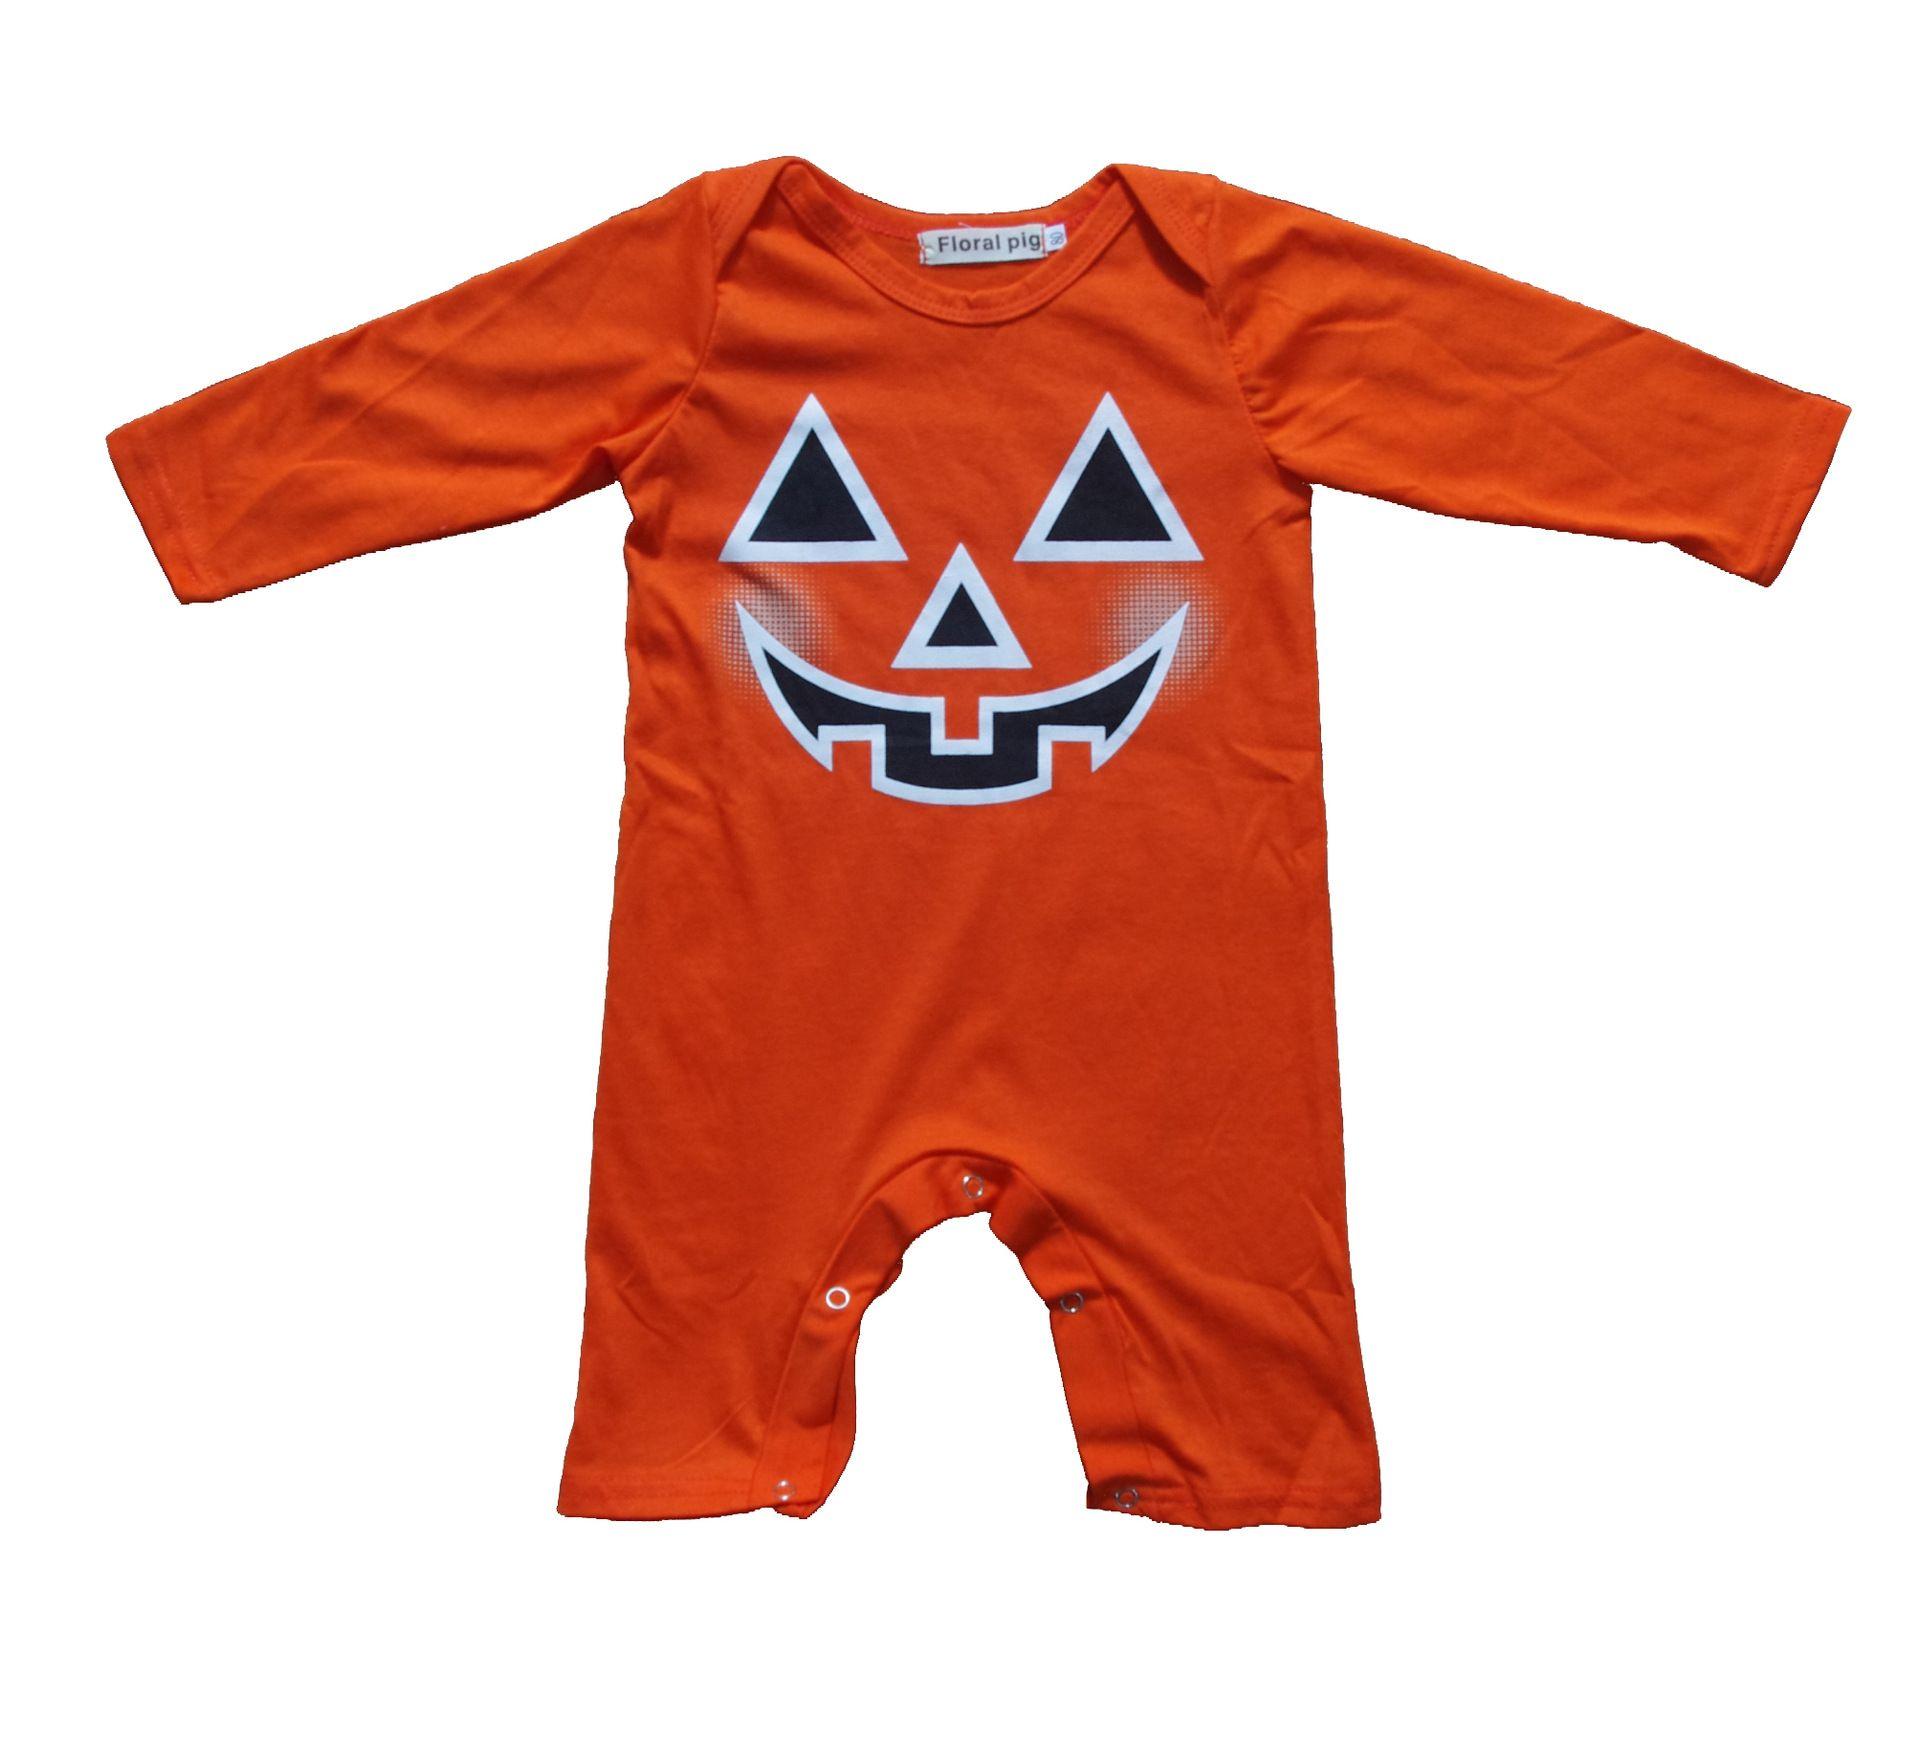 2018 newborn toddler halloween romper infant pajamas christmas bodysuit baby boys girls long sleeve jumpsuits babies autumn clothing t0429 from summervivi